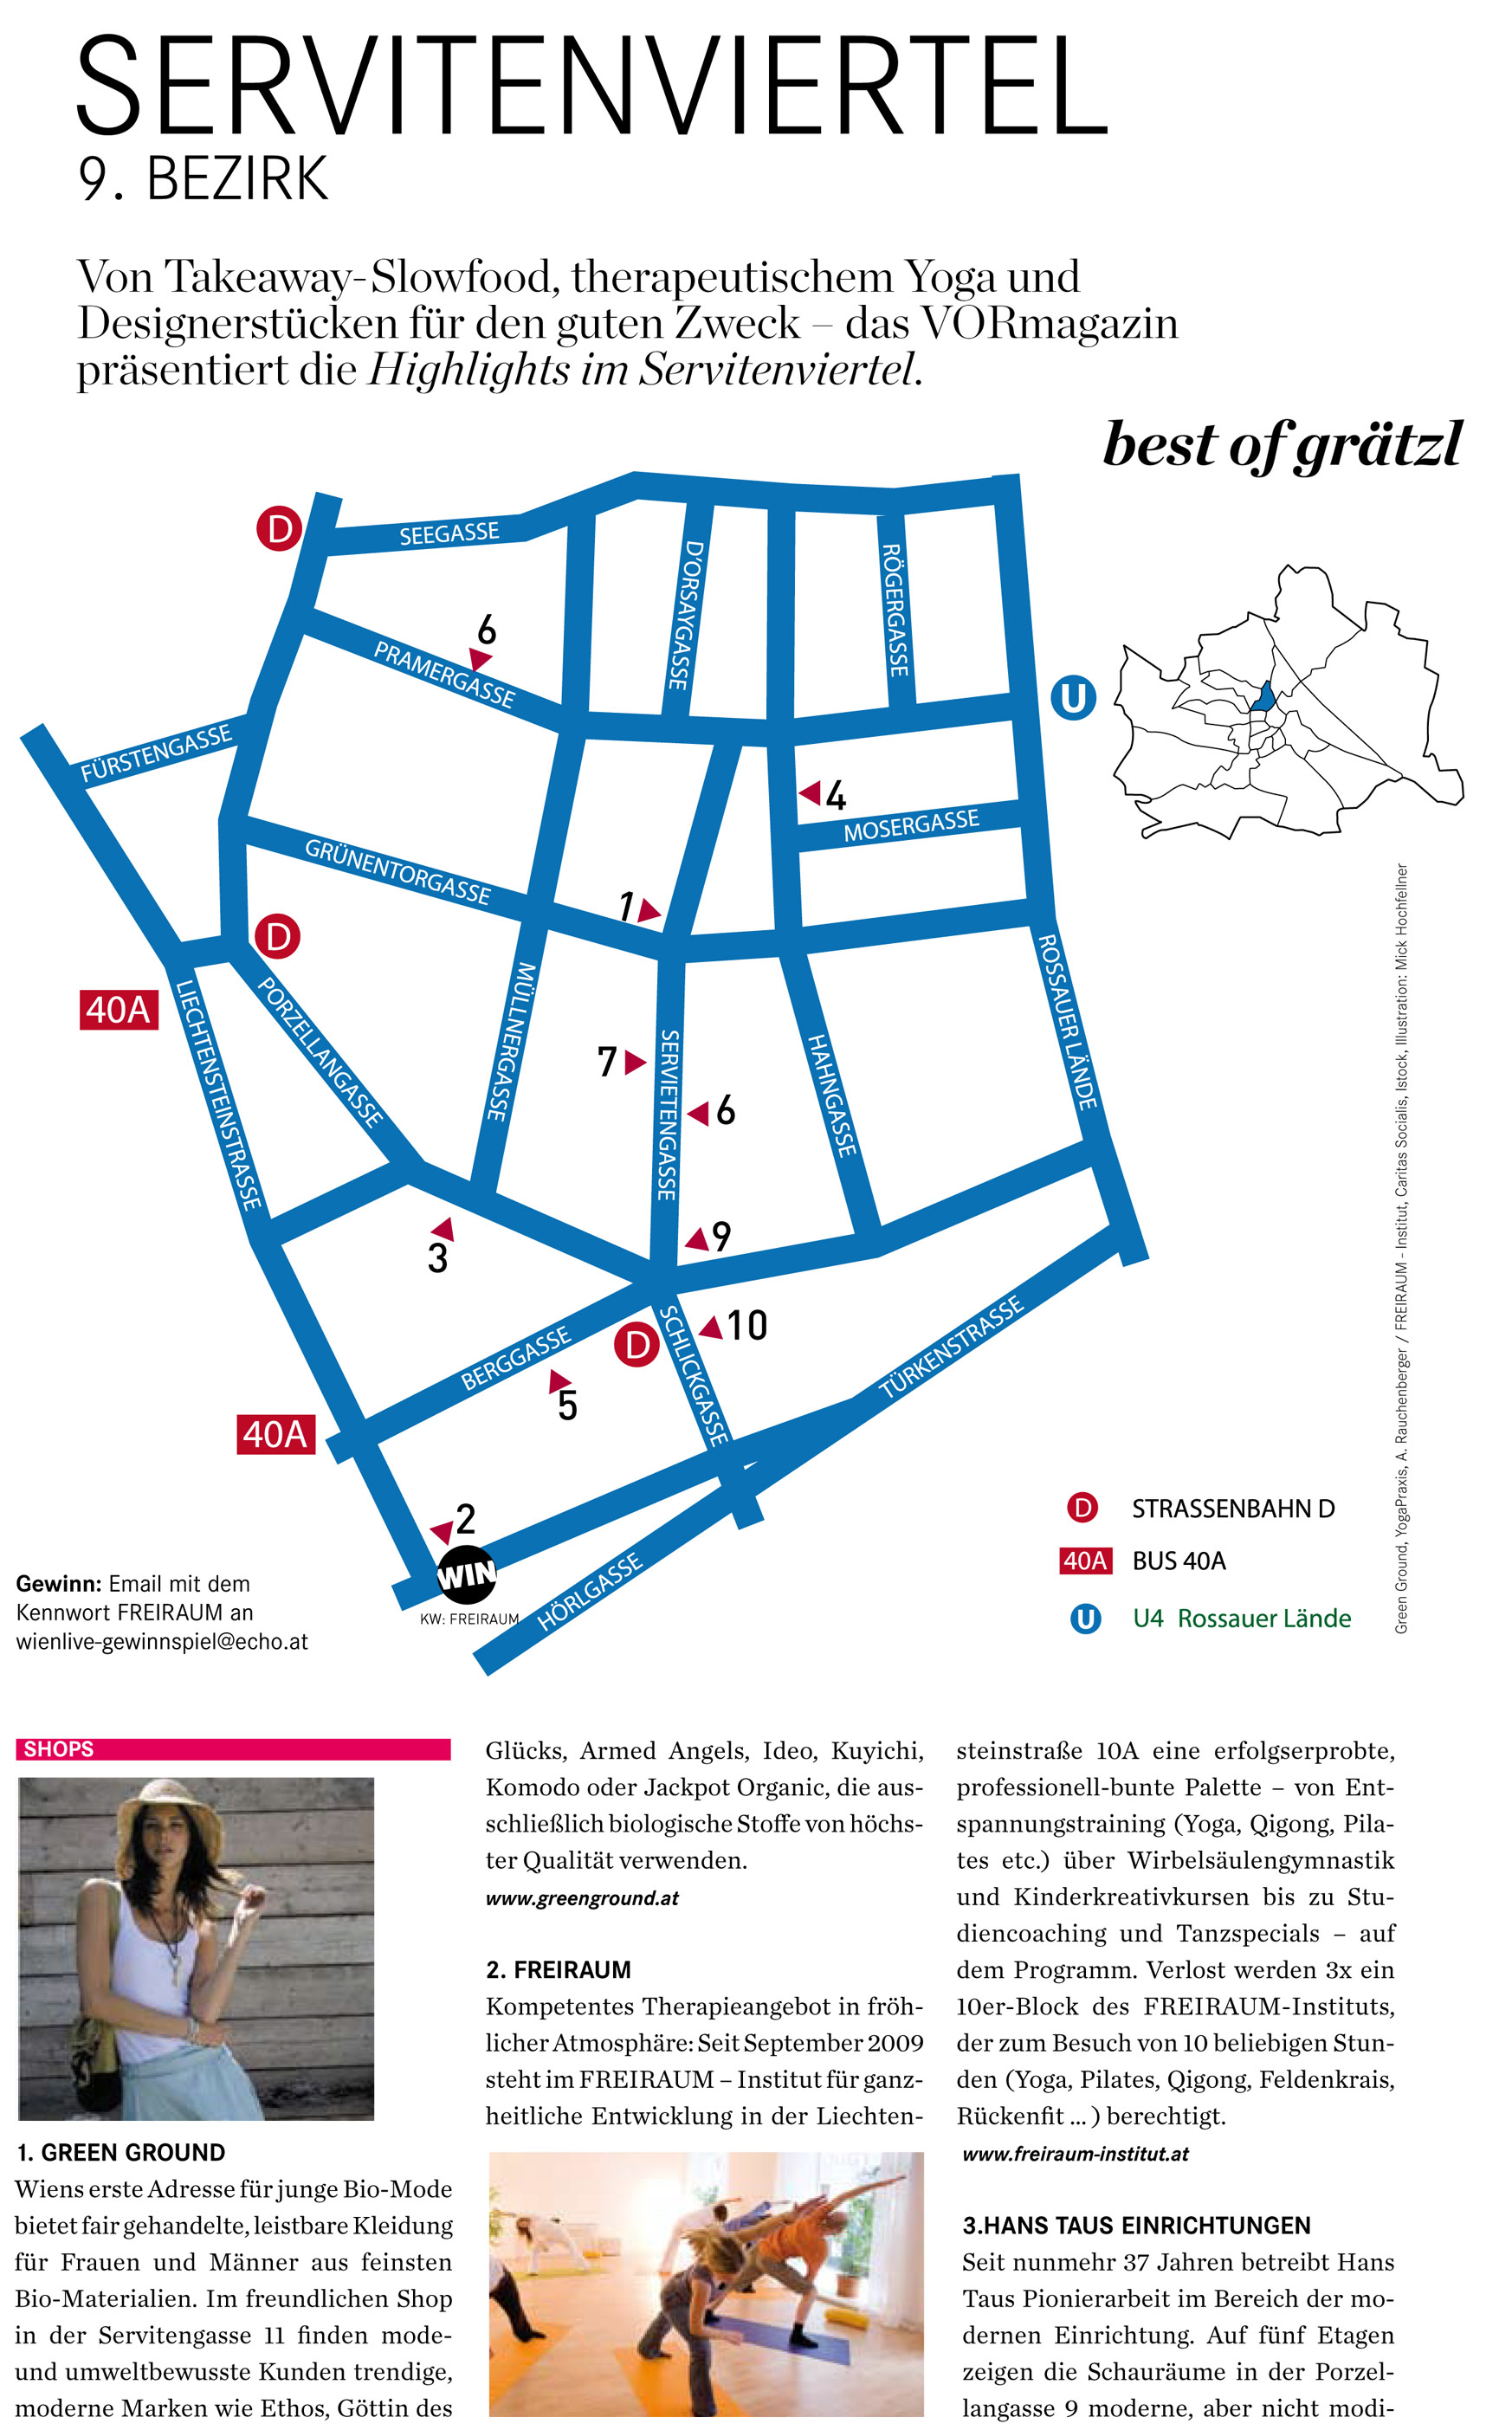 Best of VOR Magazin2010